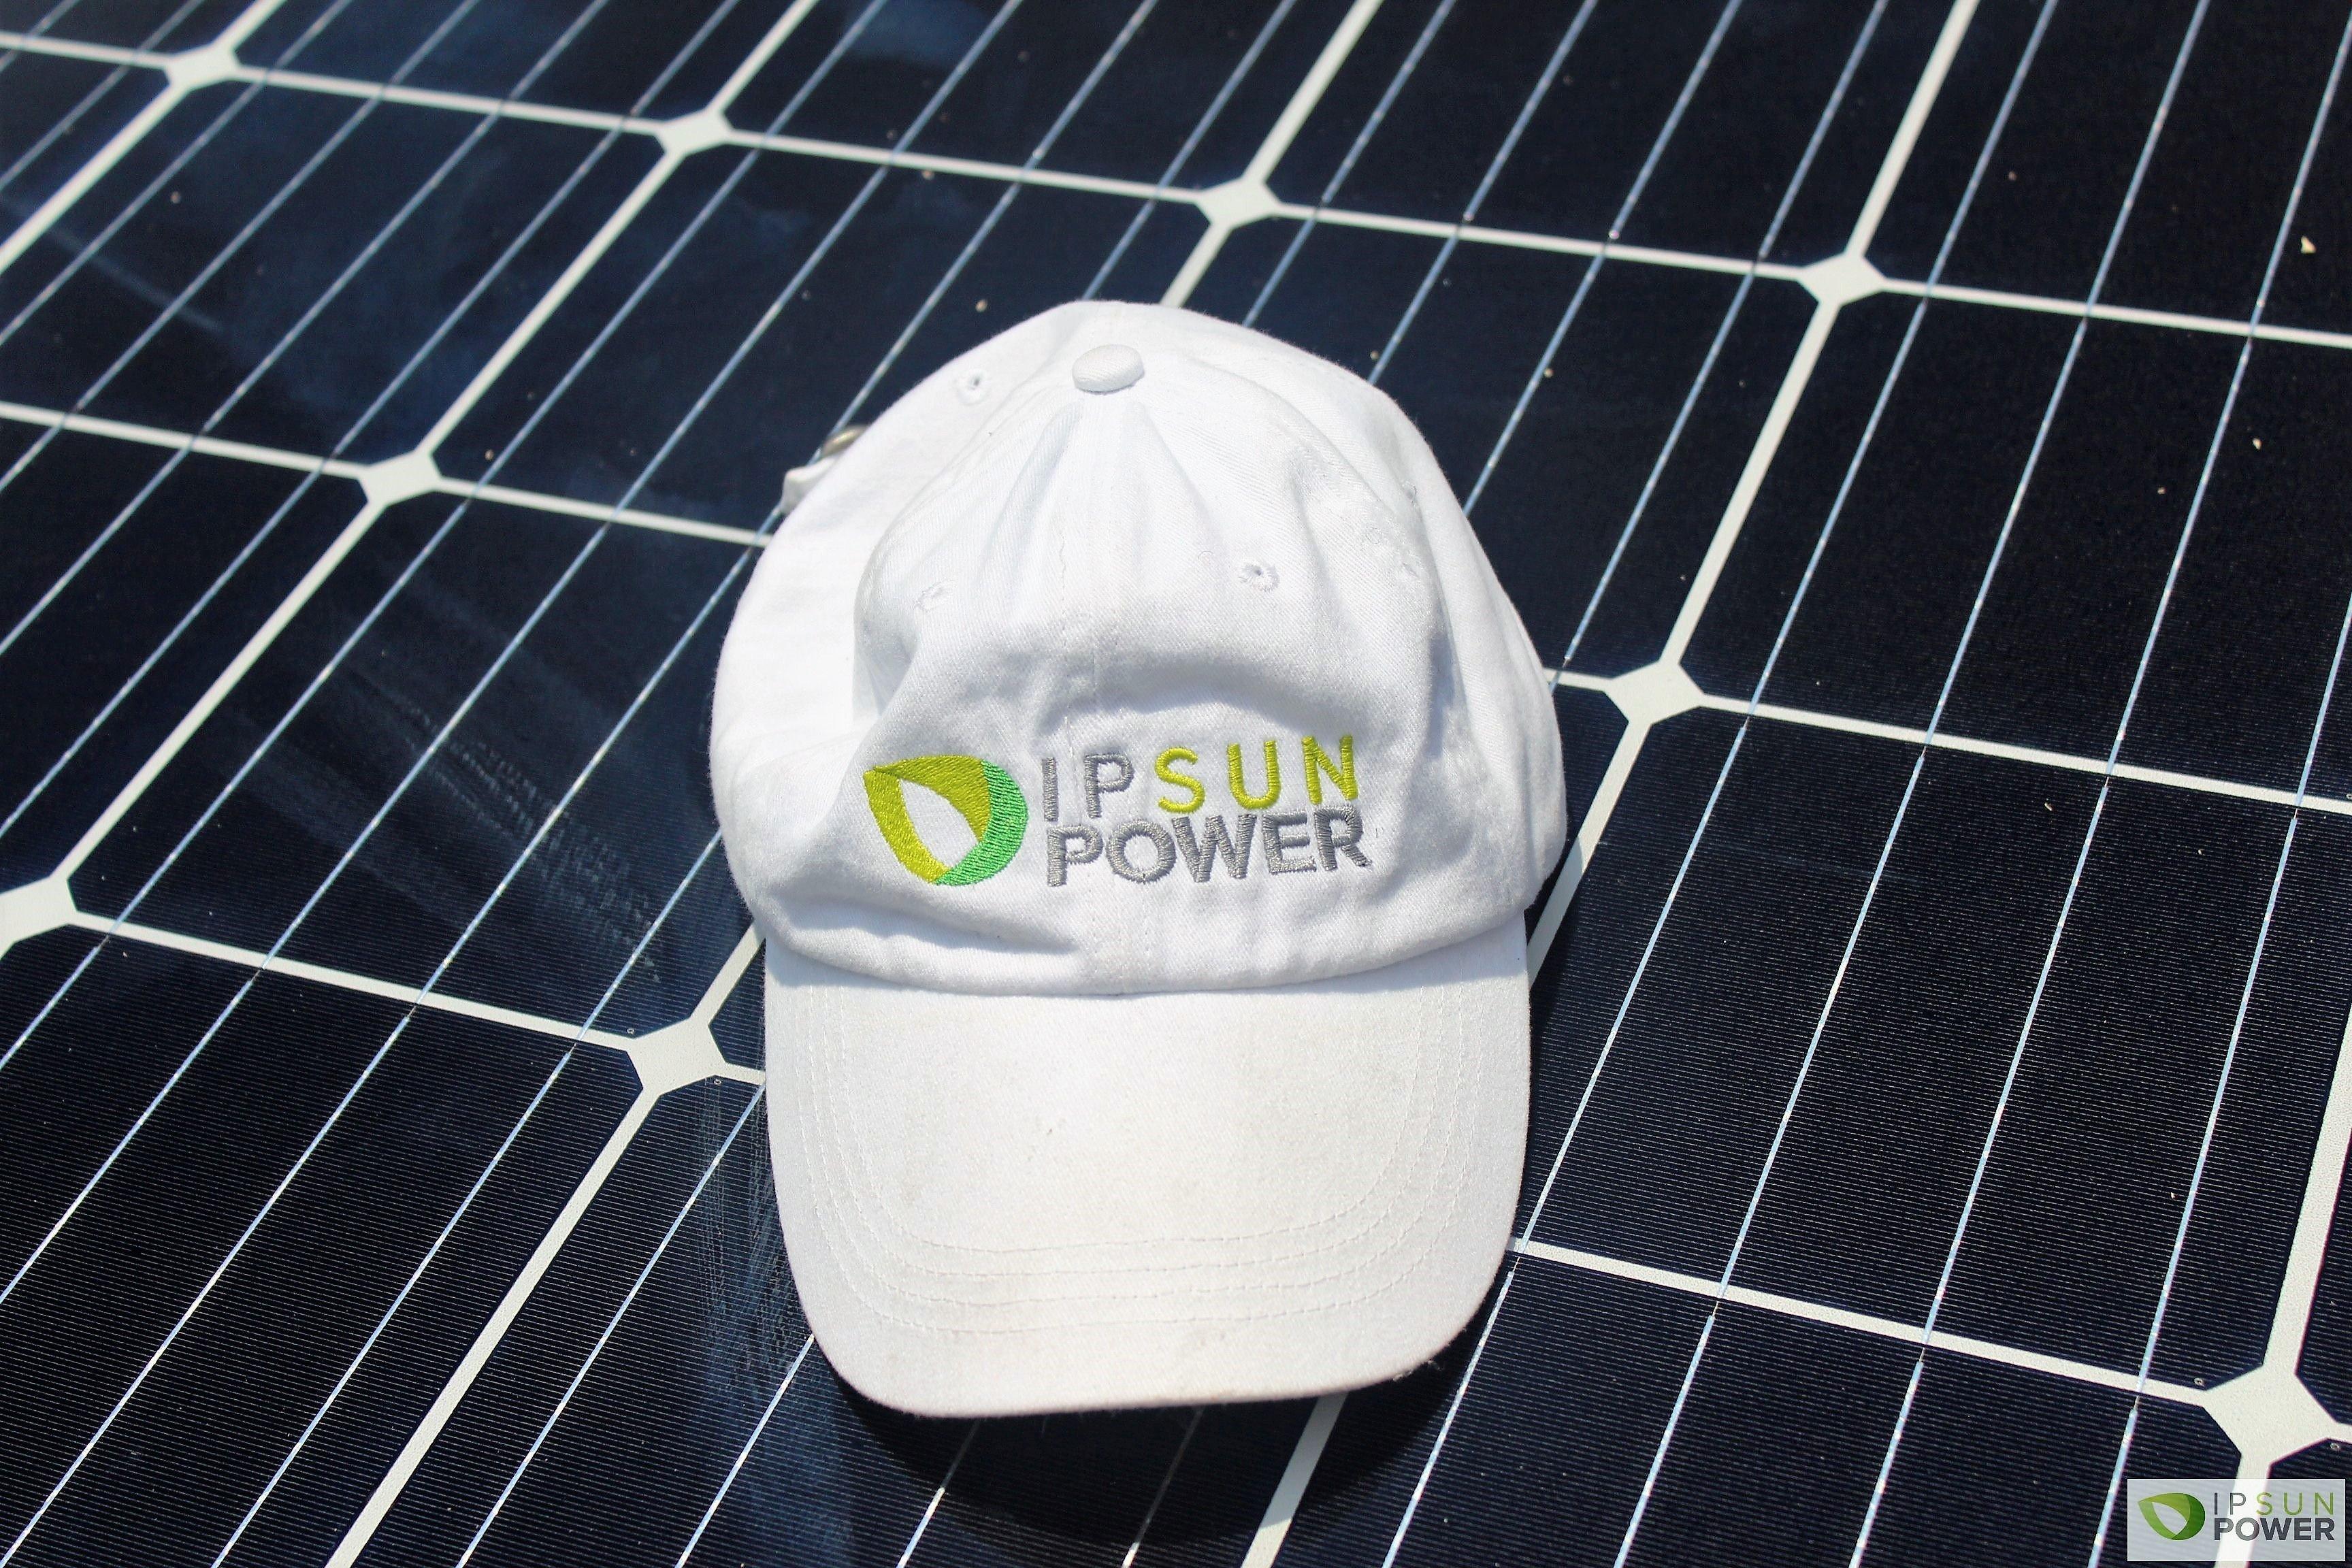 Hat with Ipsun power logo